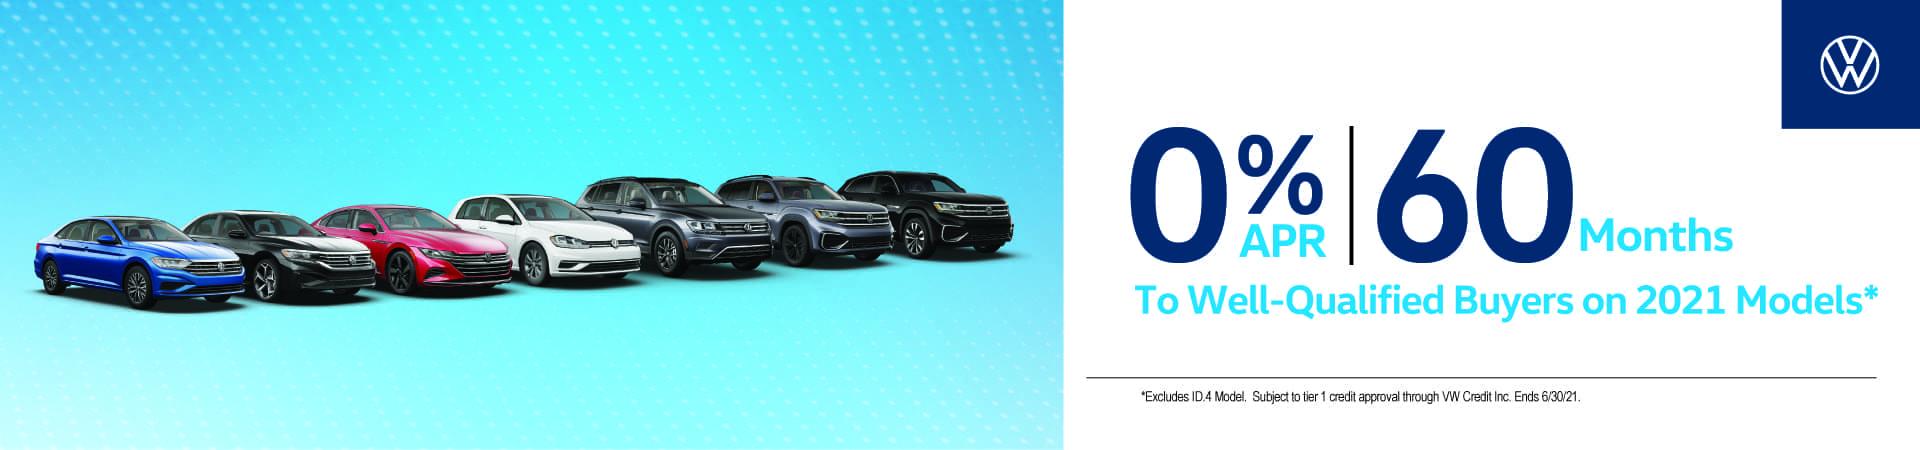 June-2021-VW-CS-Slides_0-APR-60-MO